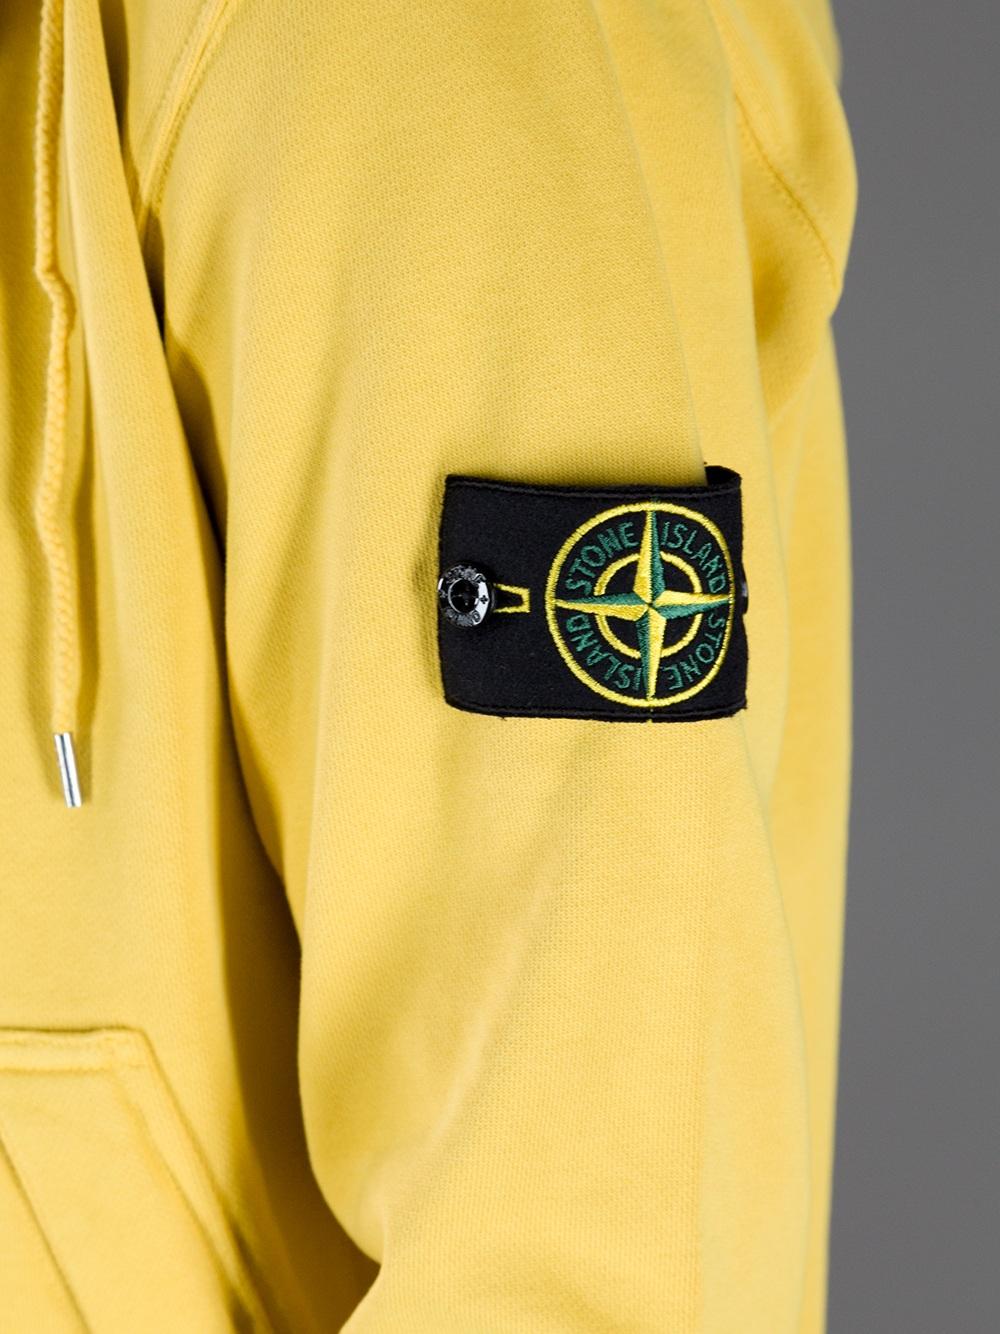 Stone island Hooded Sweatshirt in Yellow for Men - Lyst